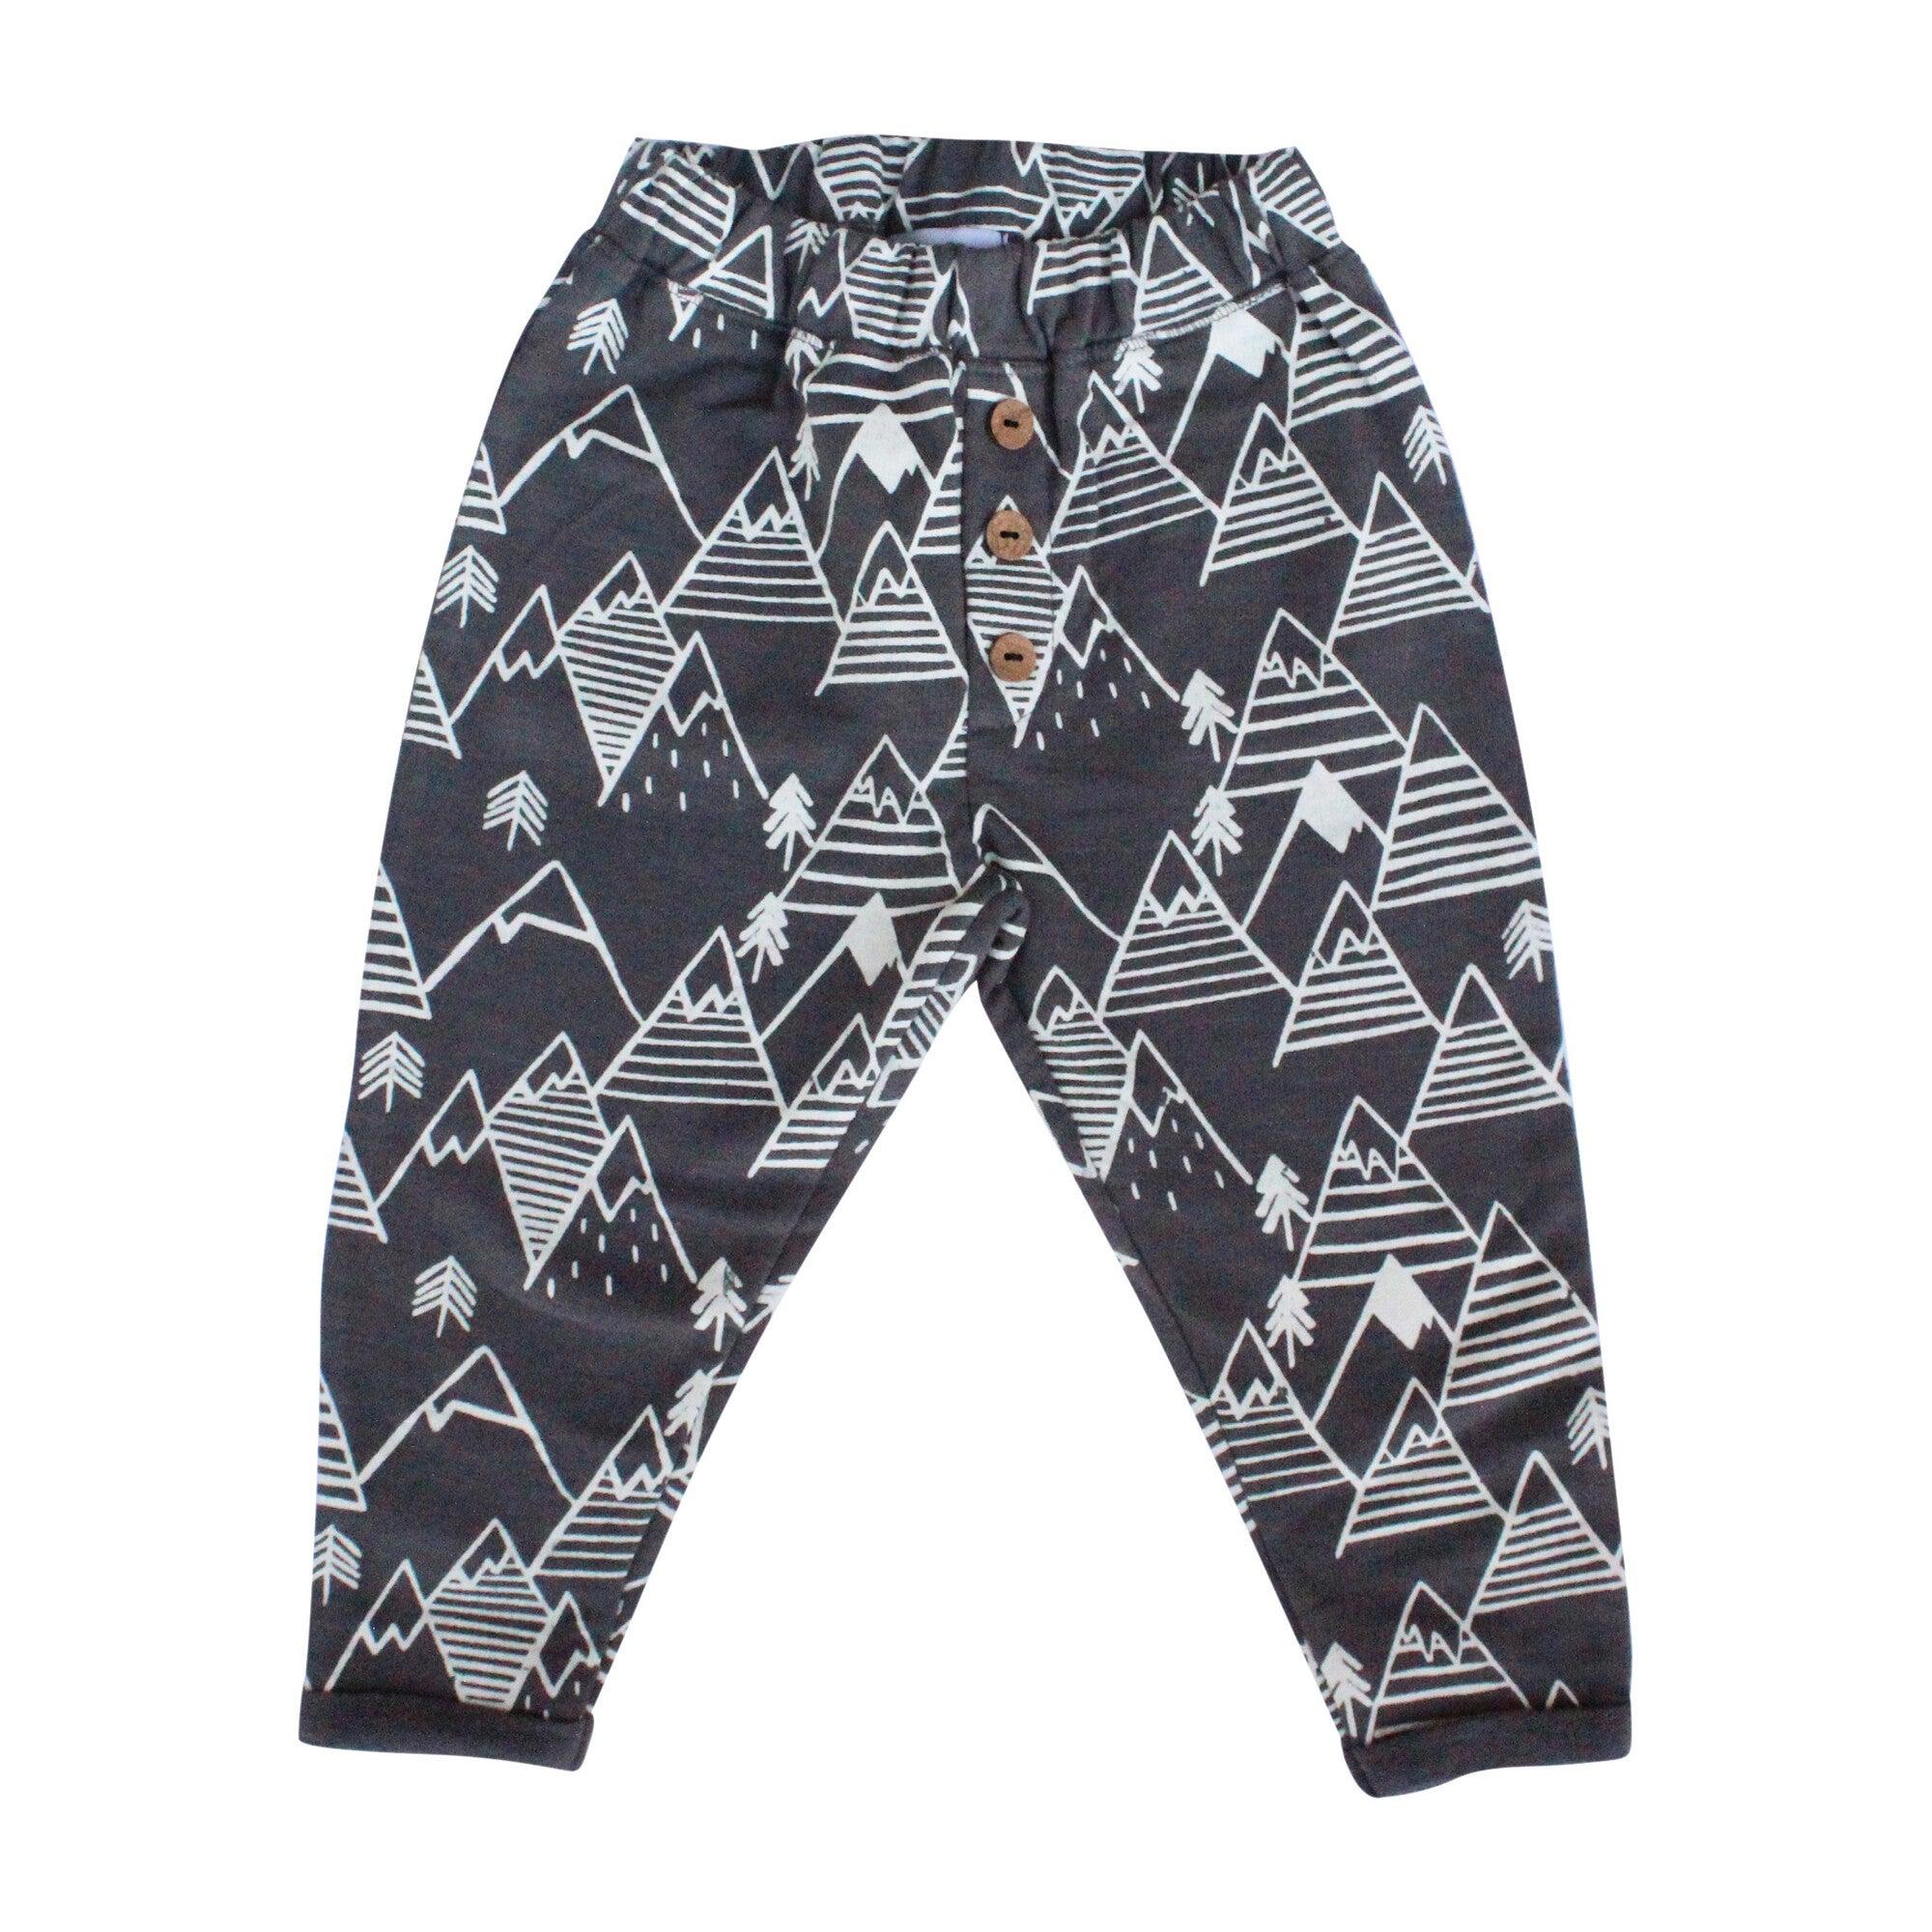 Button Pants, Gray Mountains